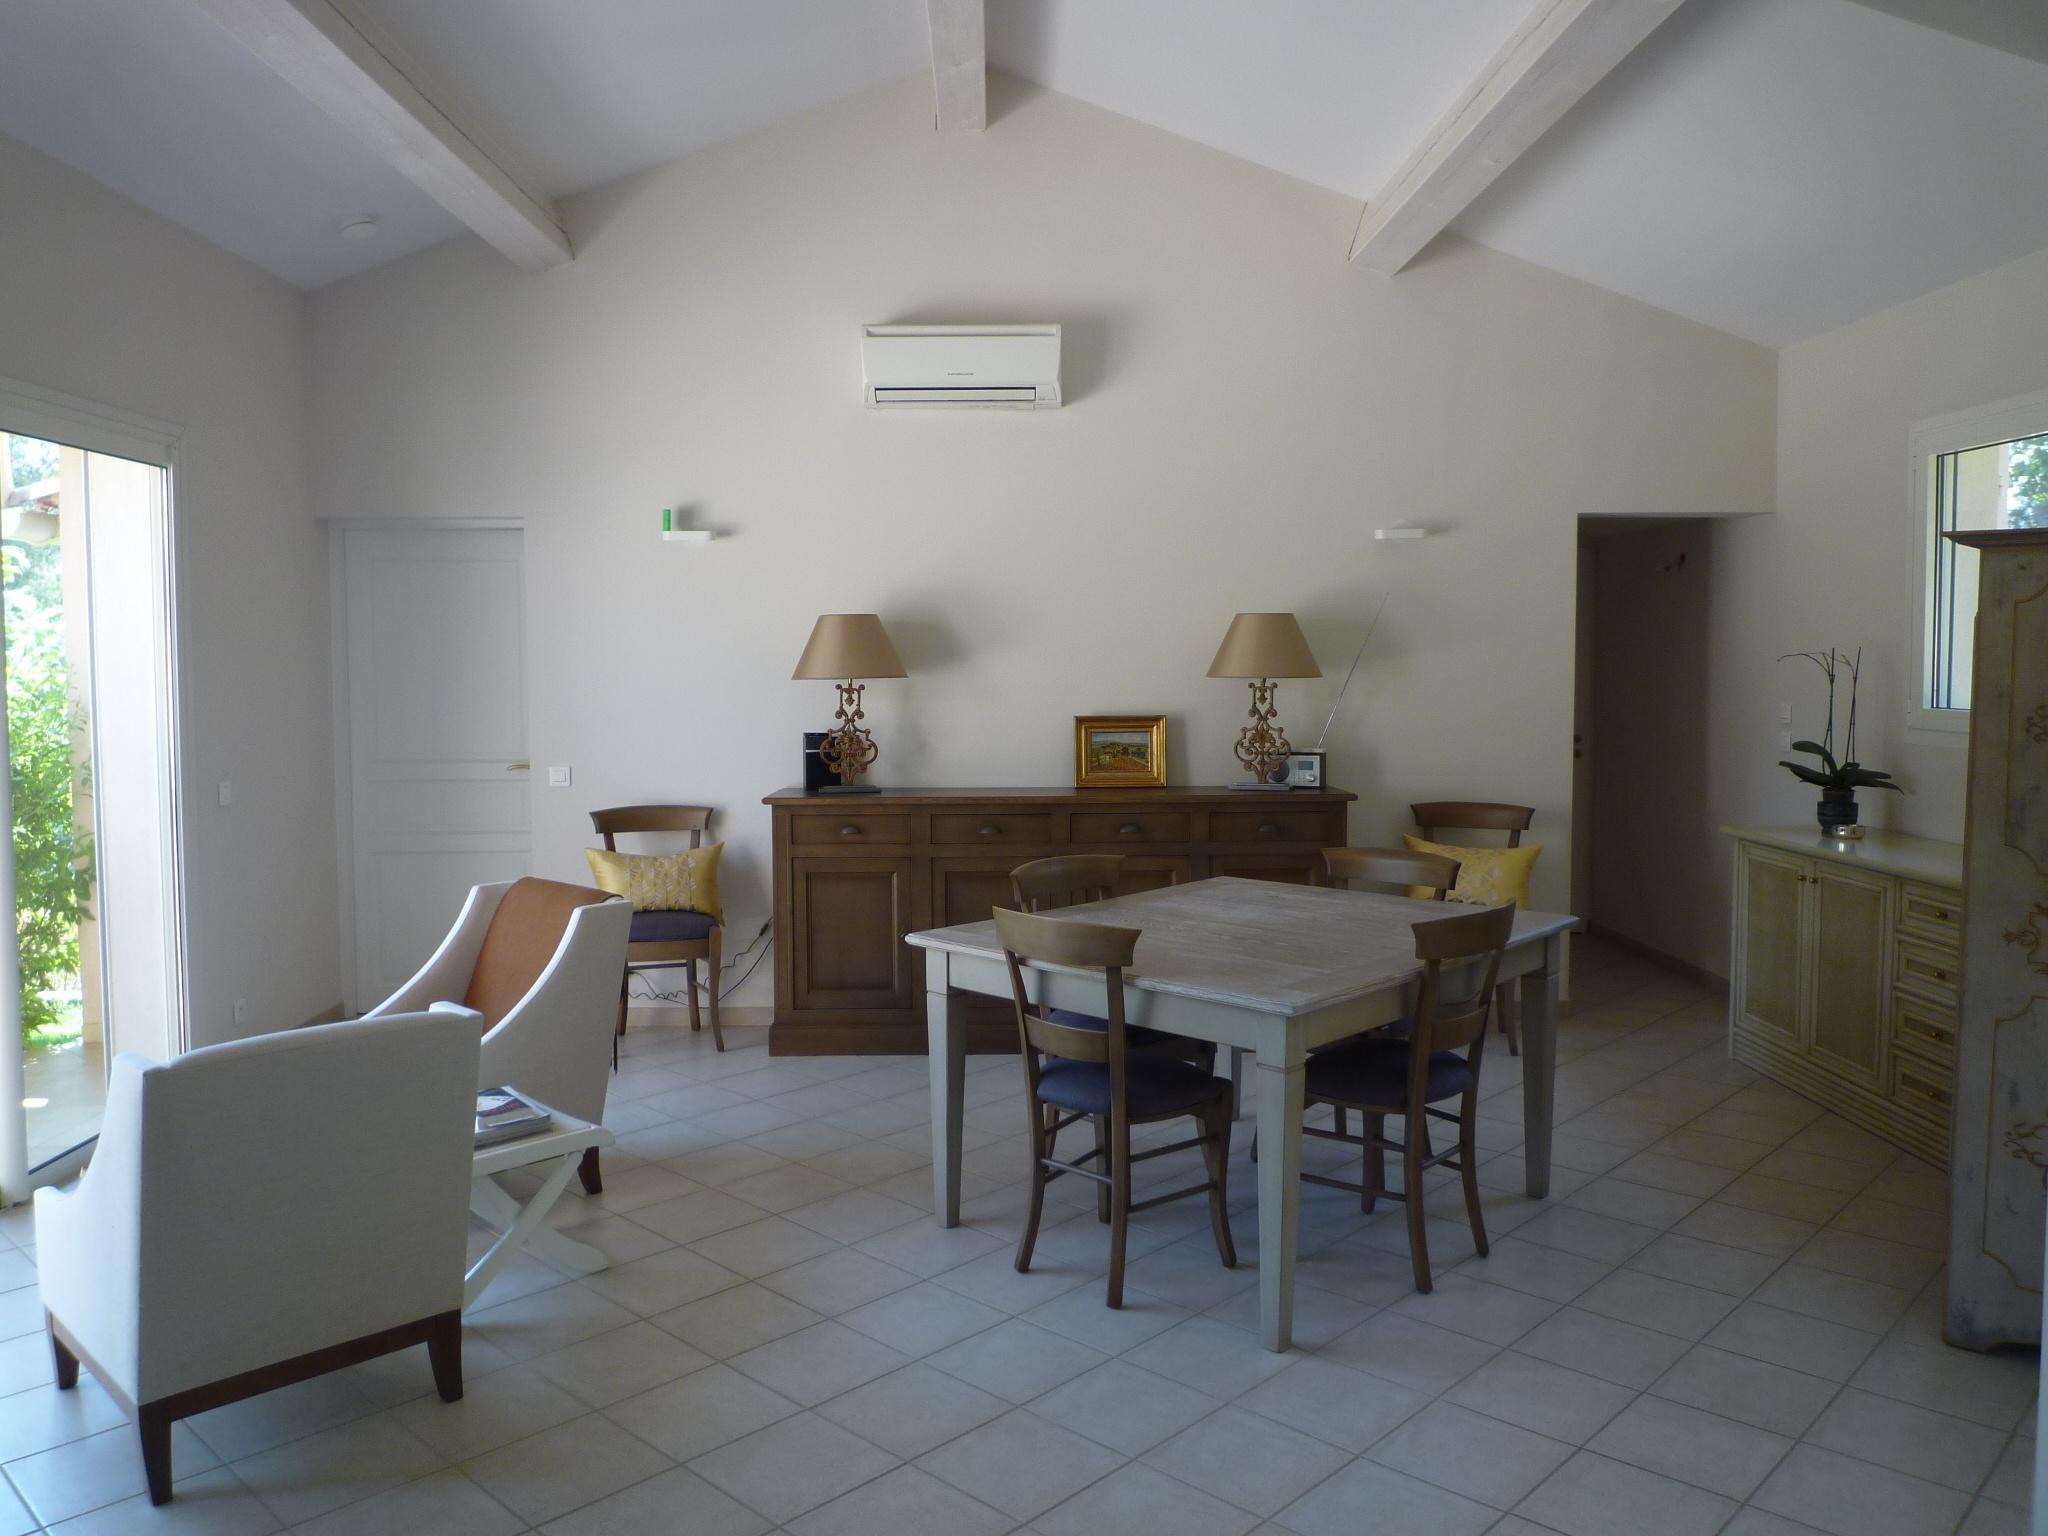 Image_5, Maison / villa, Saint-Cyr-sur-Mer, ref :30870